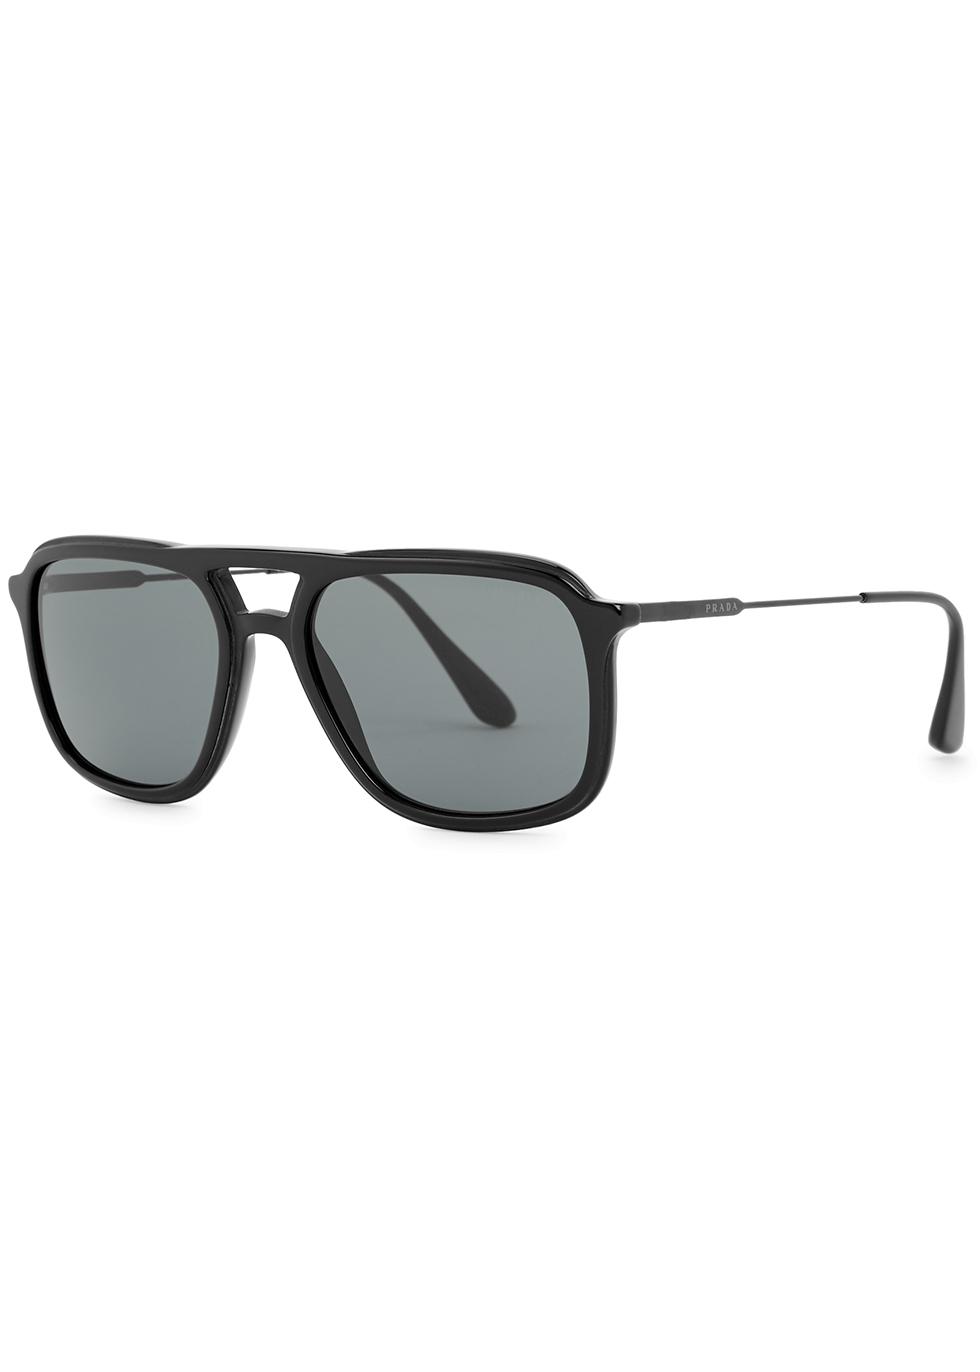 17121d83ec58 Women s Designer Sunglasses and Eyewear - Harvey Nichols